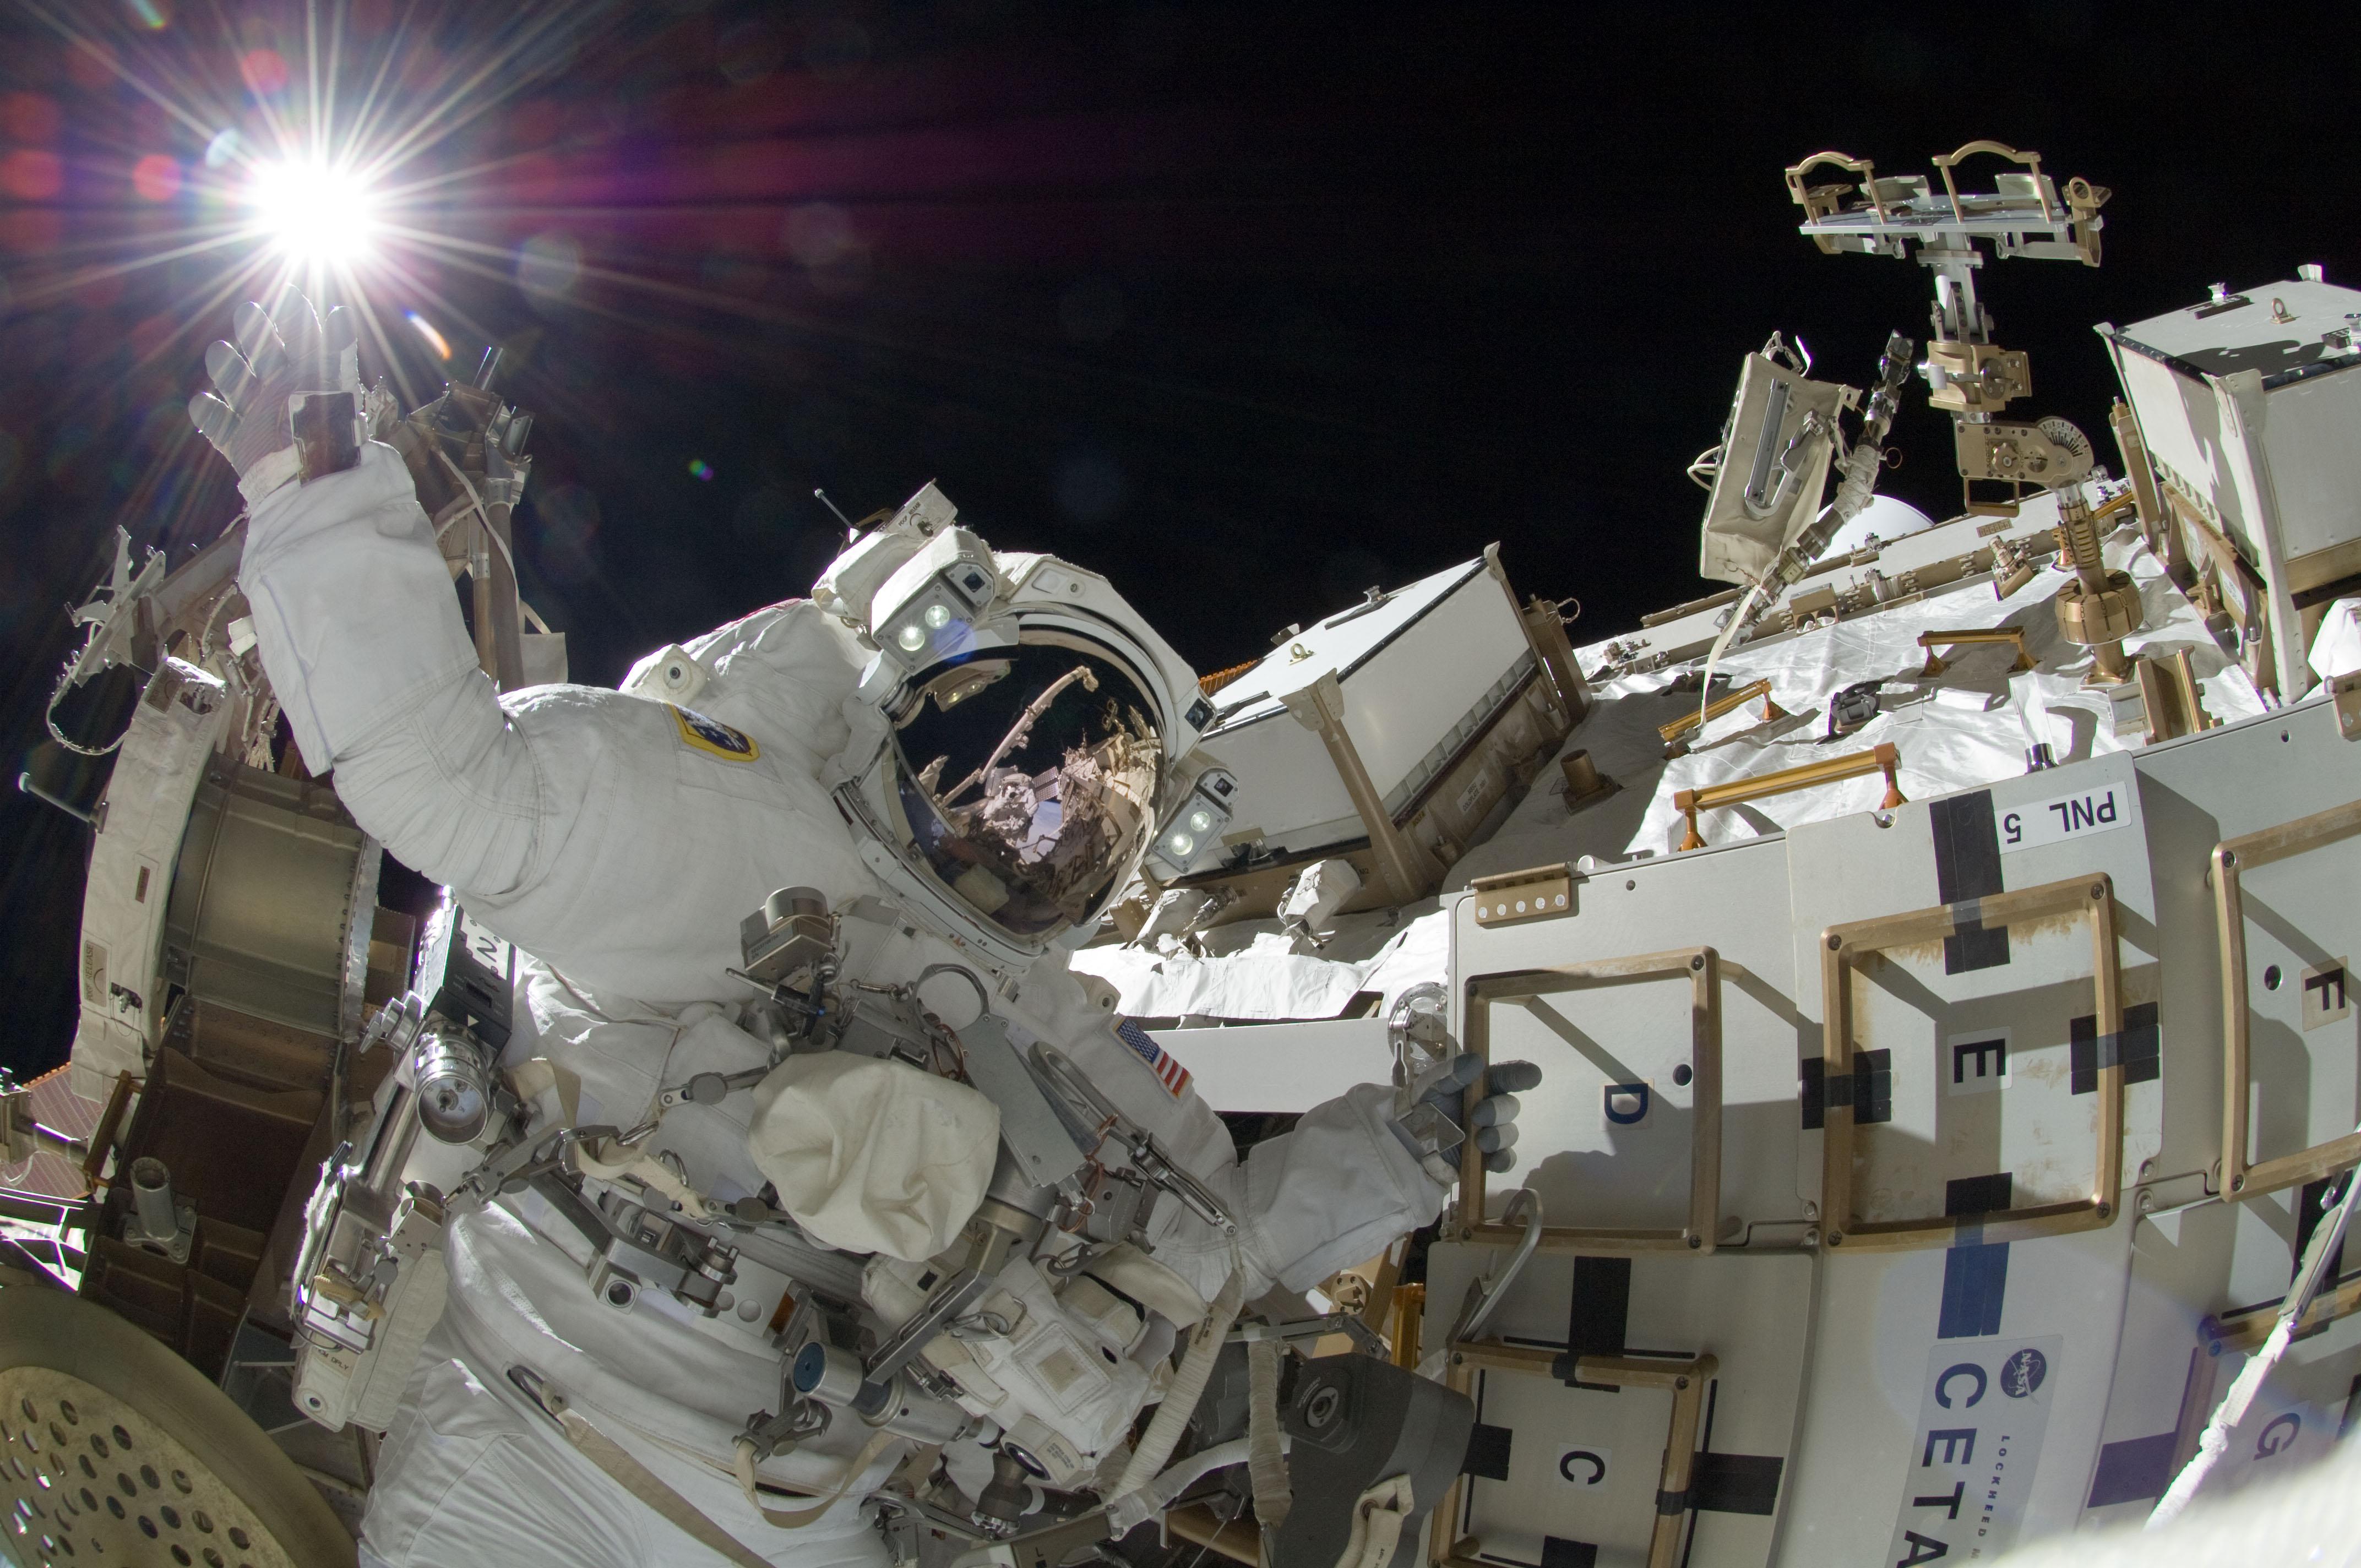 sunita williams on spacewalk nasa